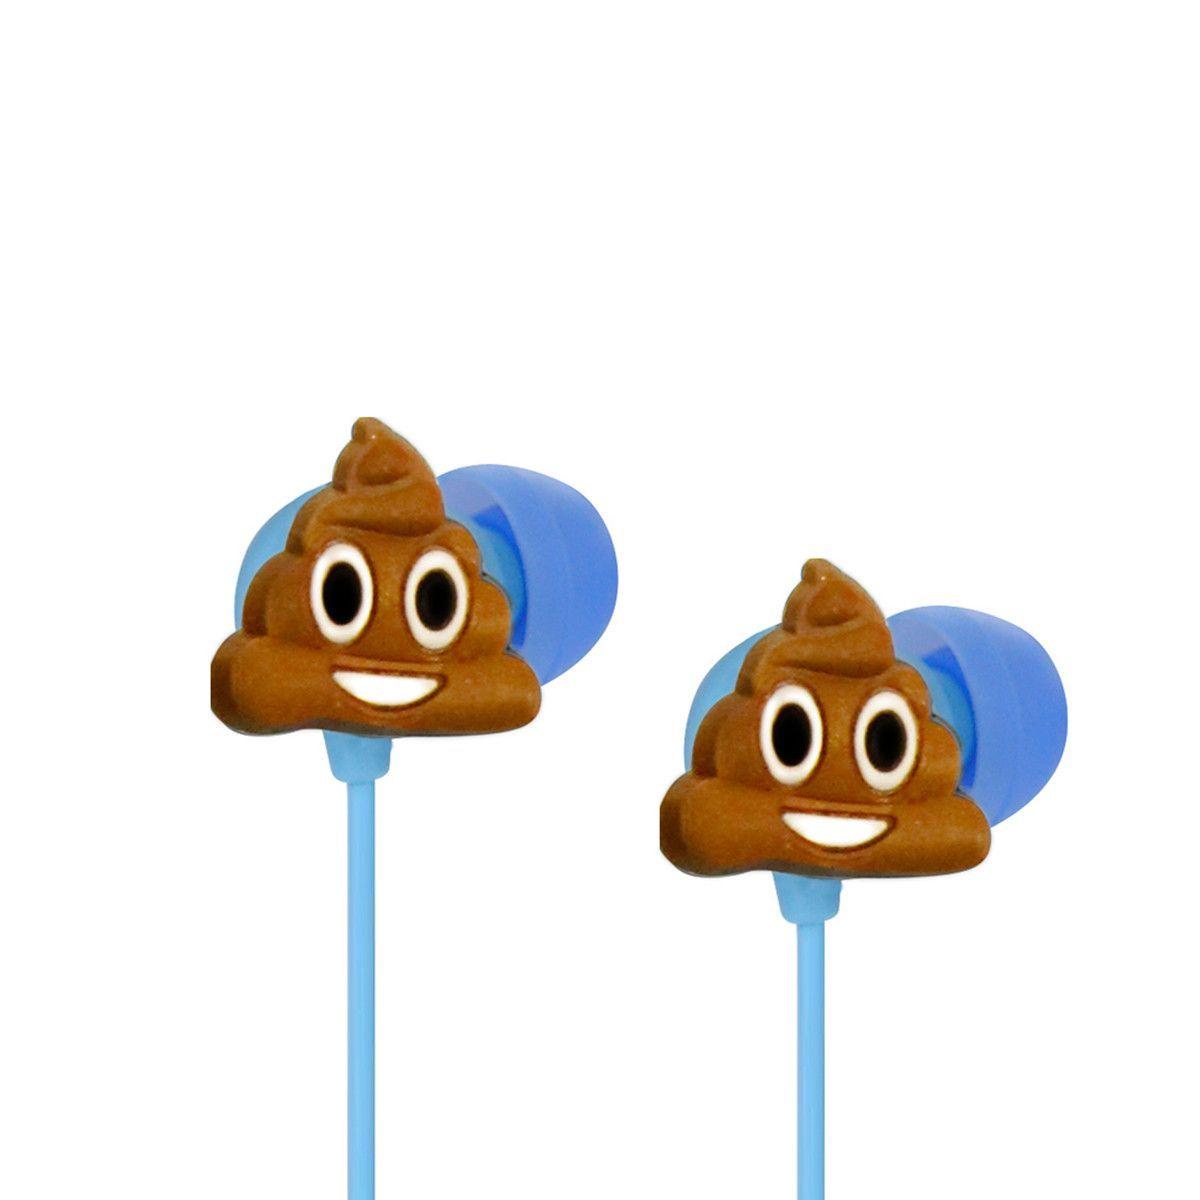 Poop Emoji earbuds http://www.amazon.com/SoundPie-Universal ...